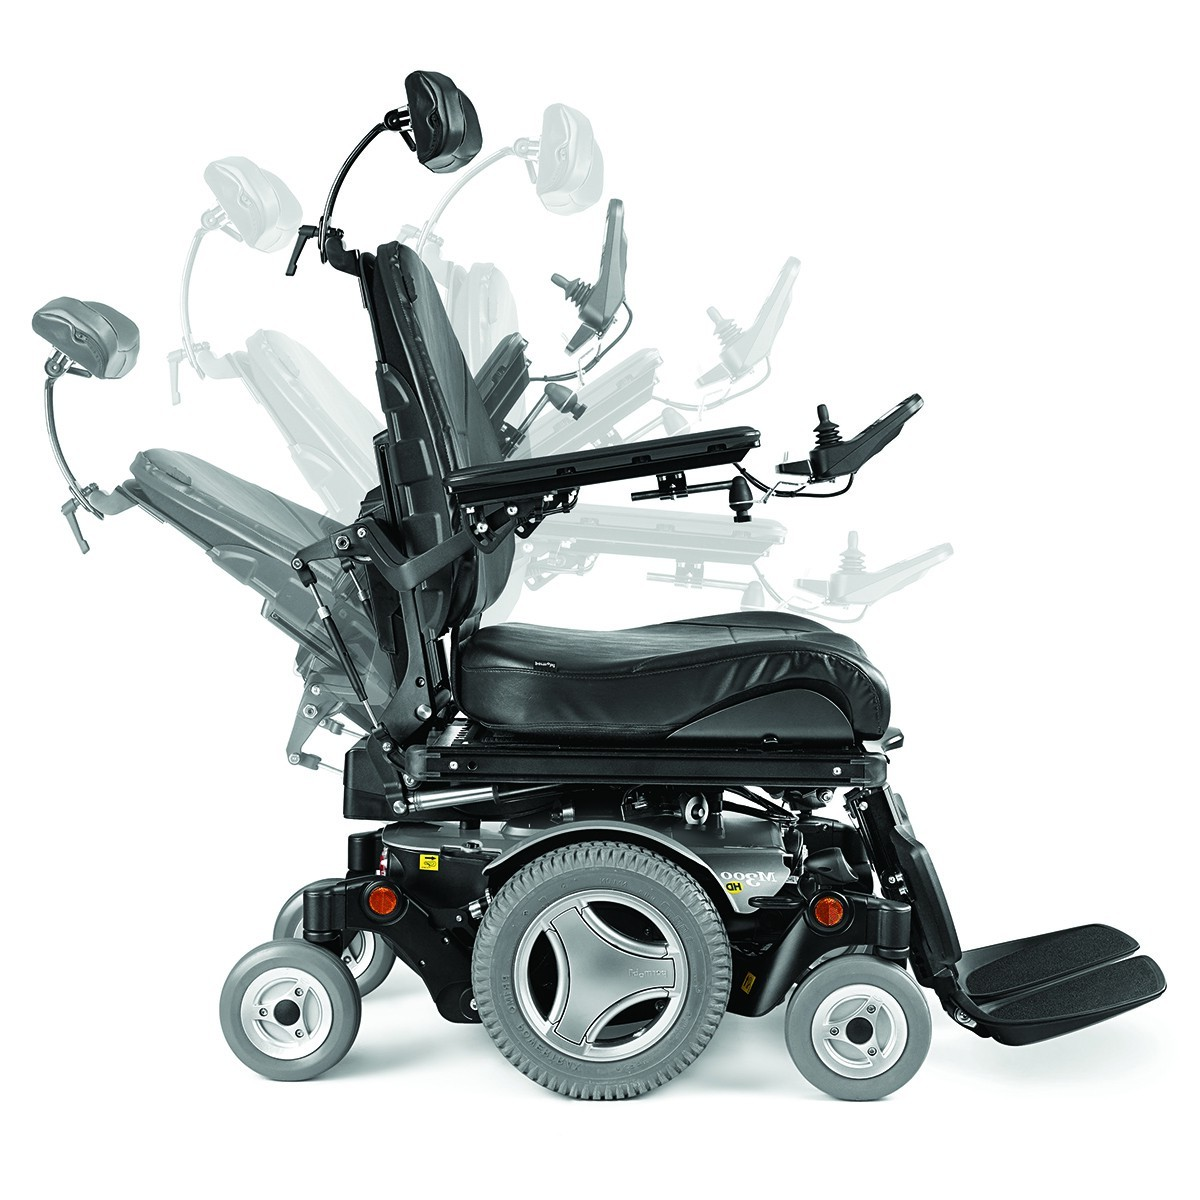 Permobil M300 Corpus HD Heavy Duty Power Wheelchair